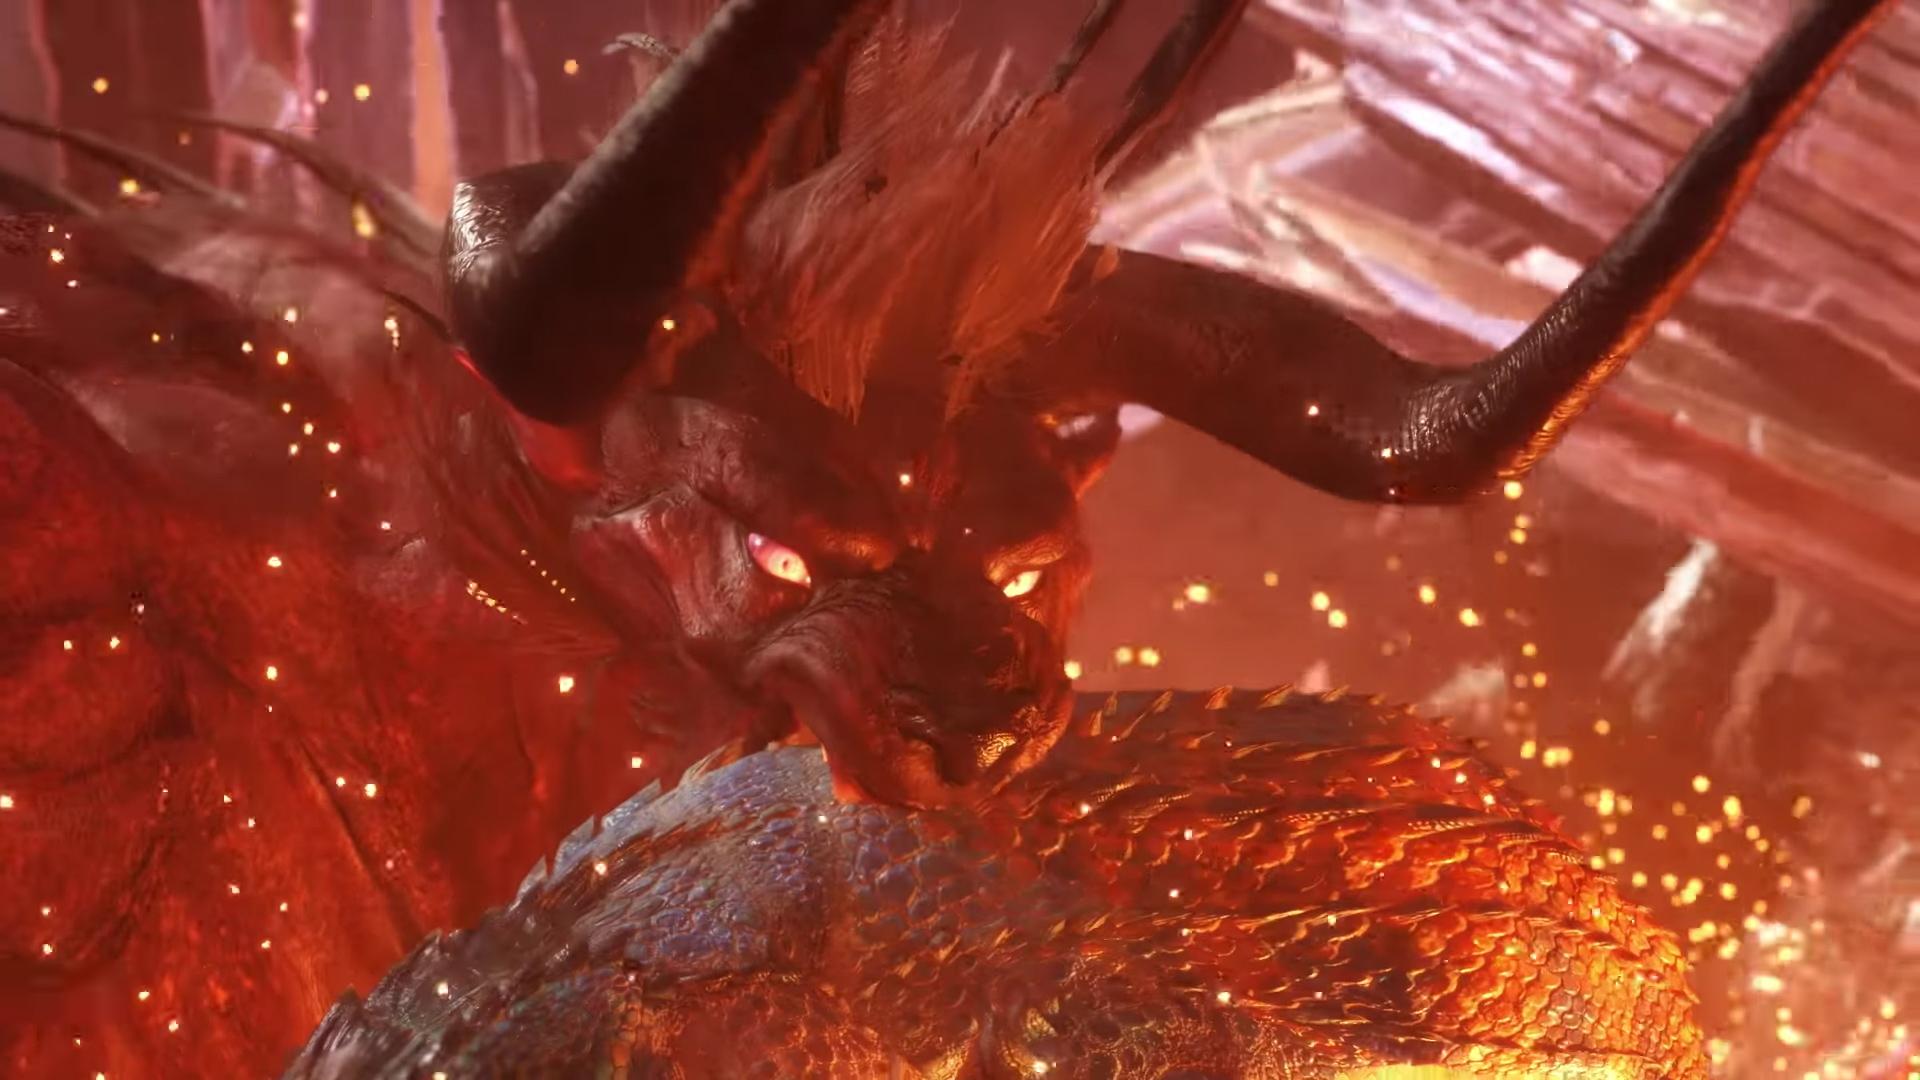 Final Fantasy XIV's Behemoth won't hit Monster Hunter: World until August screenshot